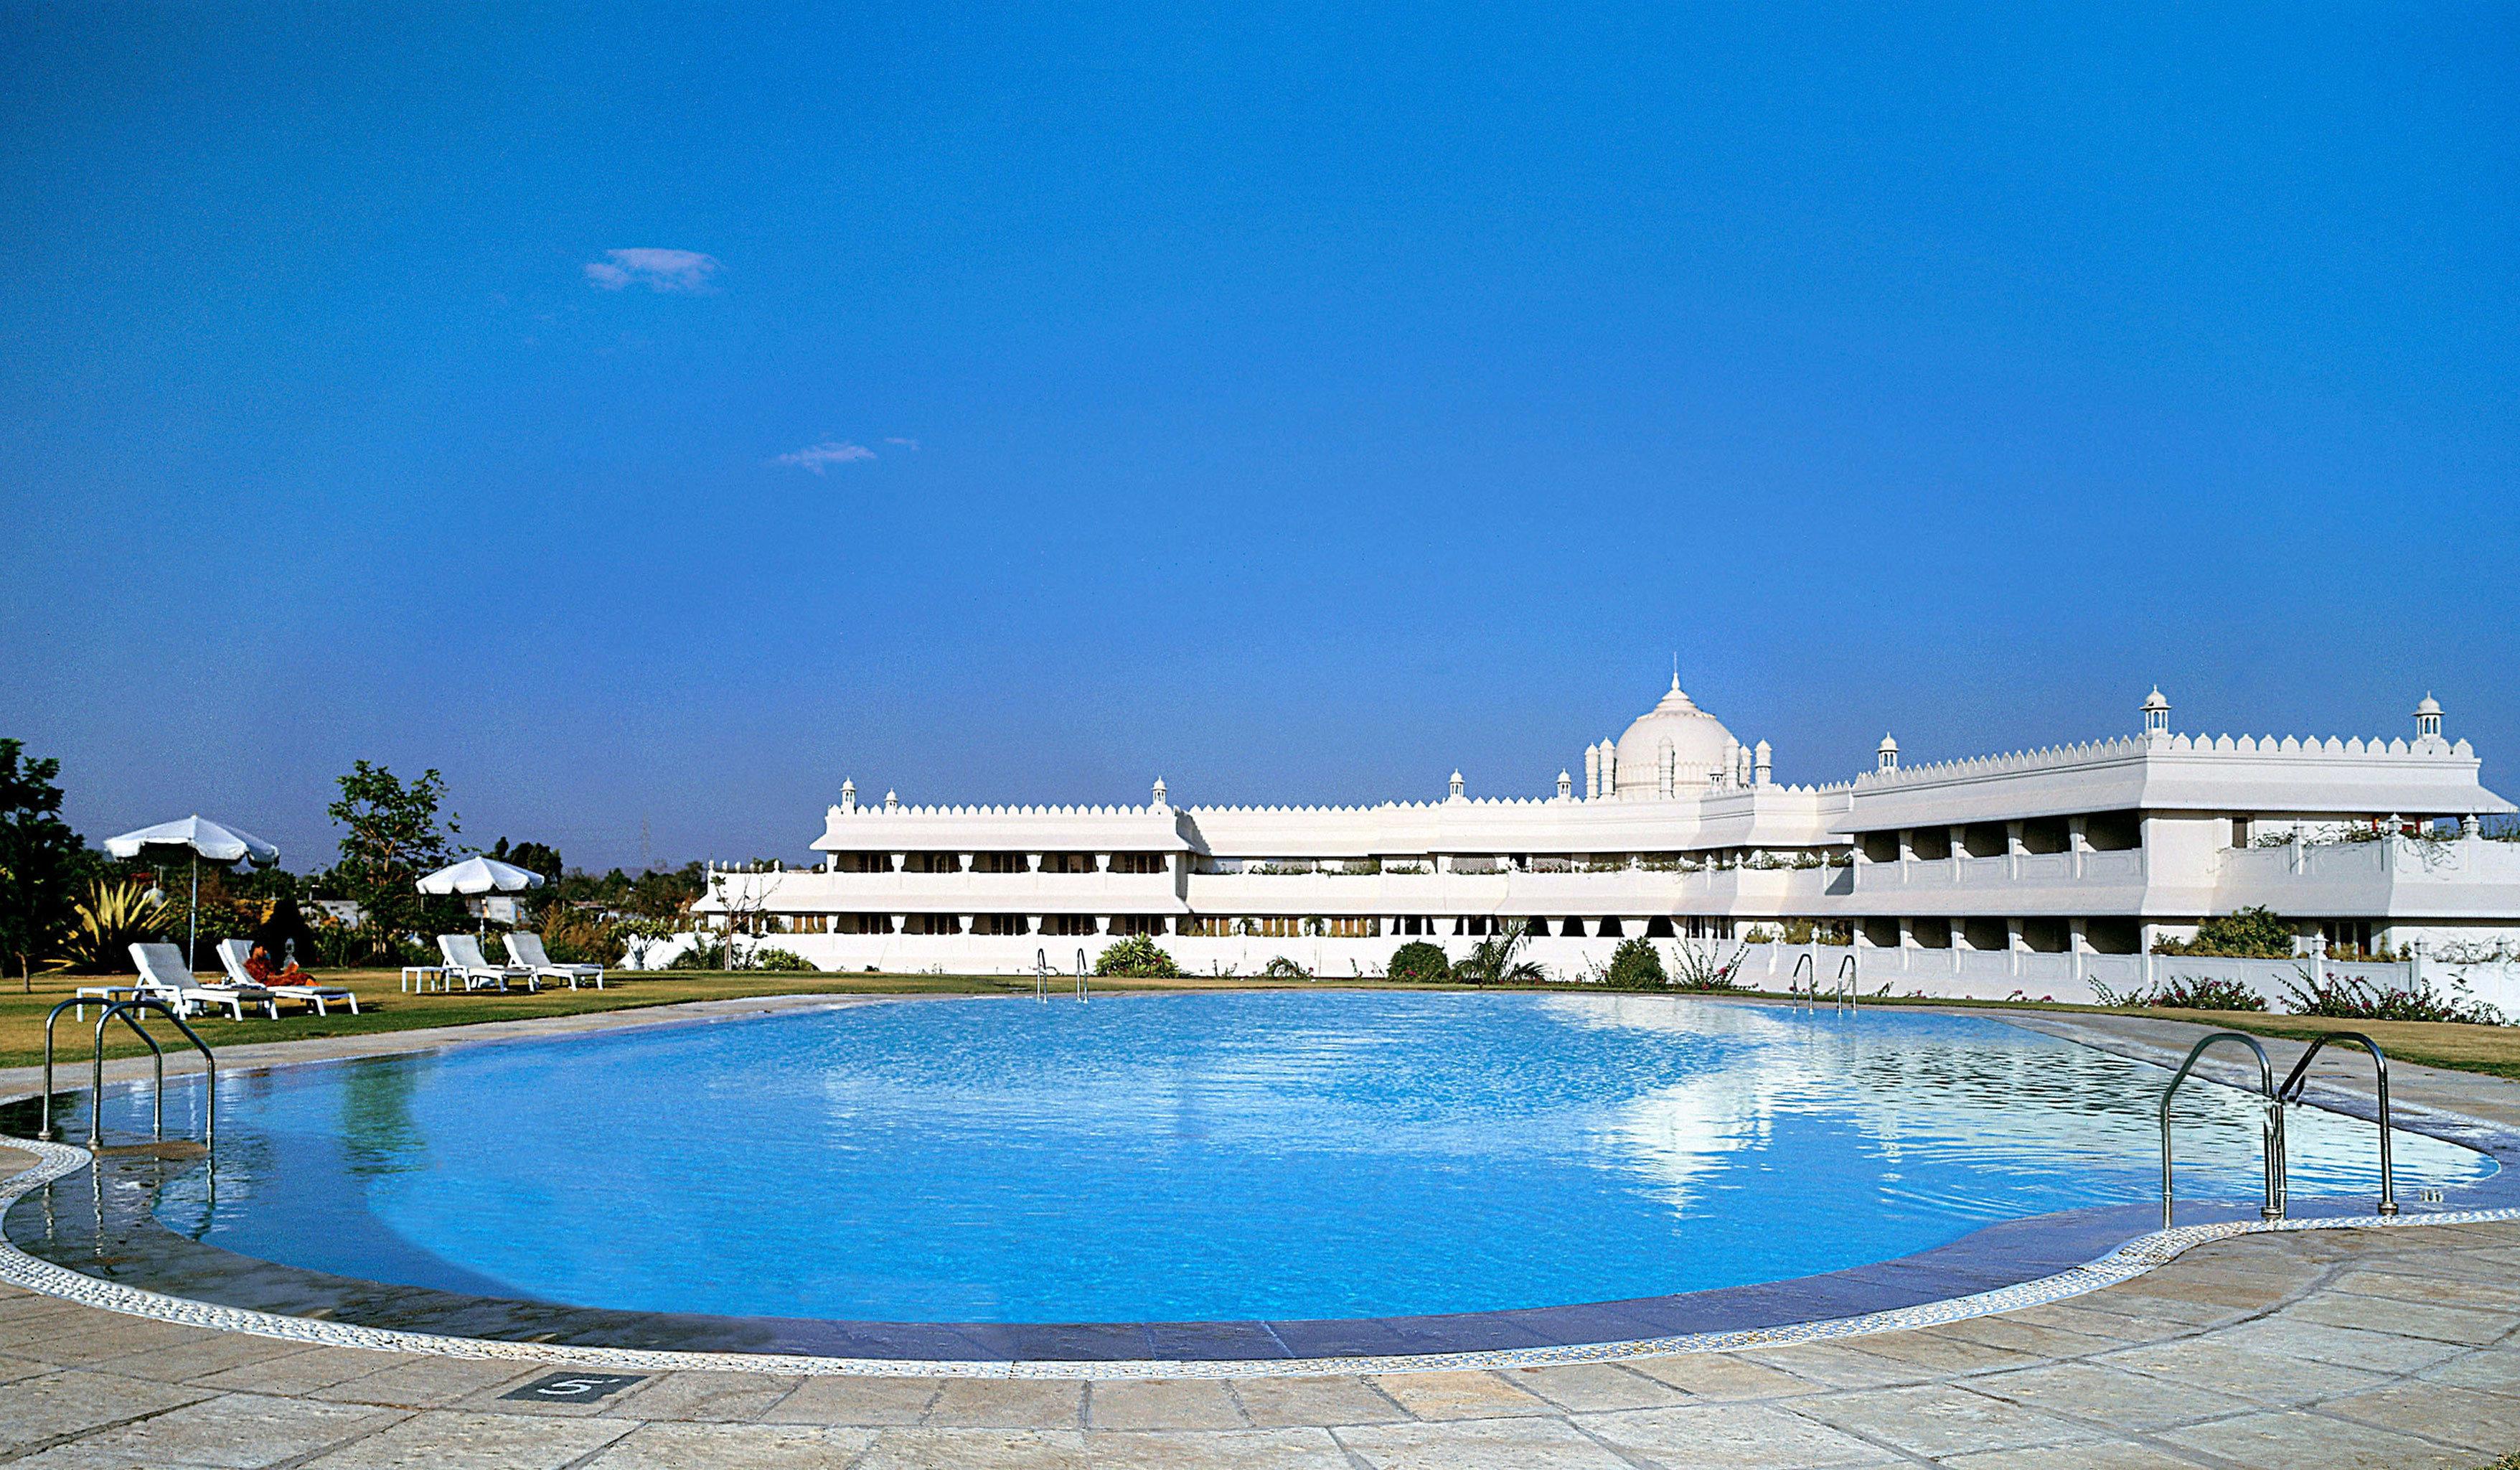 Exterior Grounds Patio Pool water sky swimming pool property Resort blue swimming palace resort town Villa Sea shore